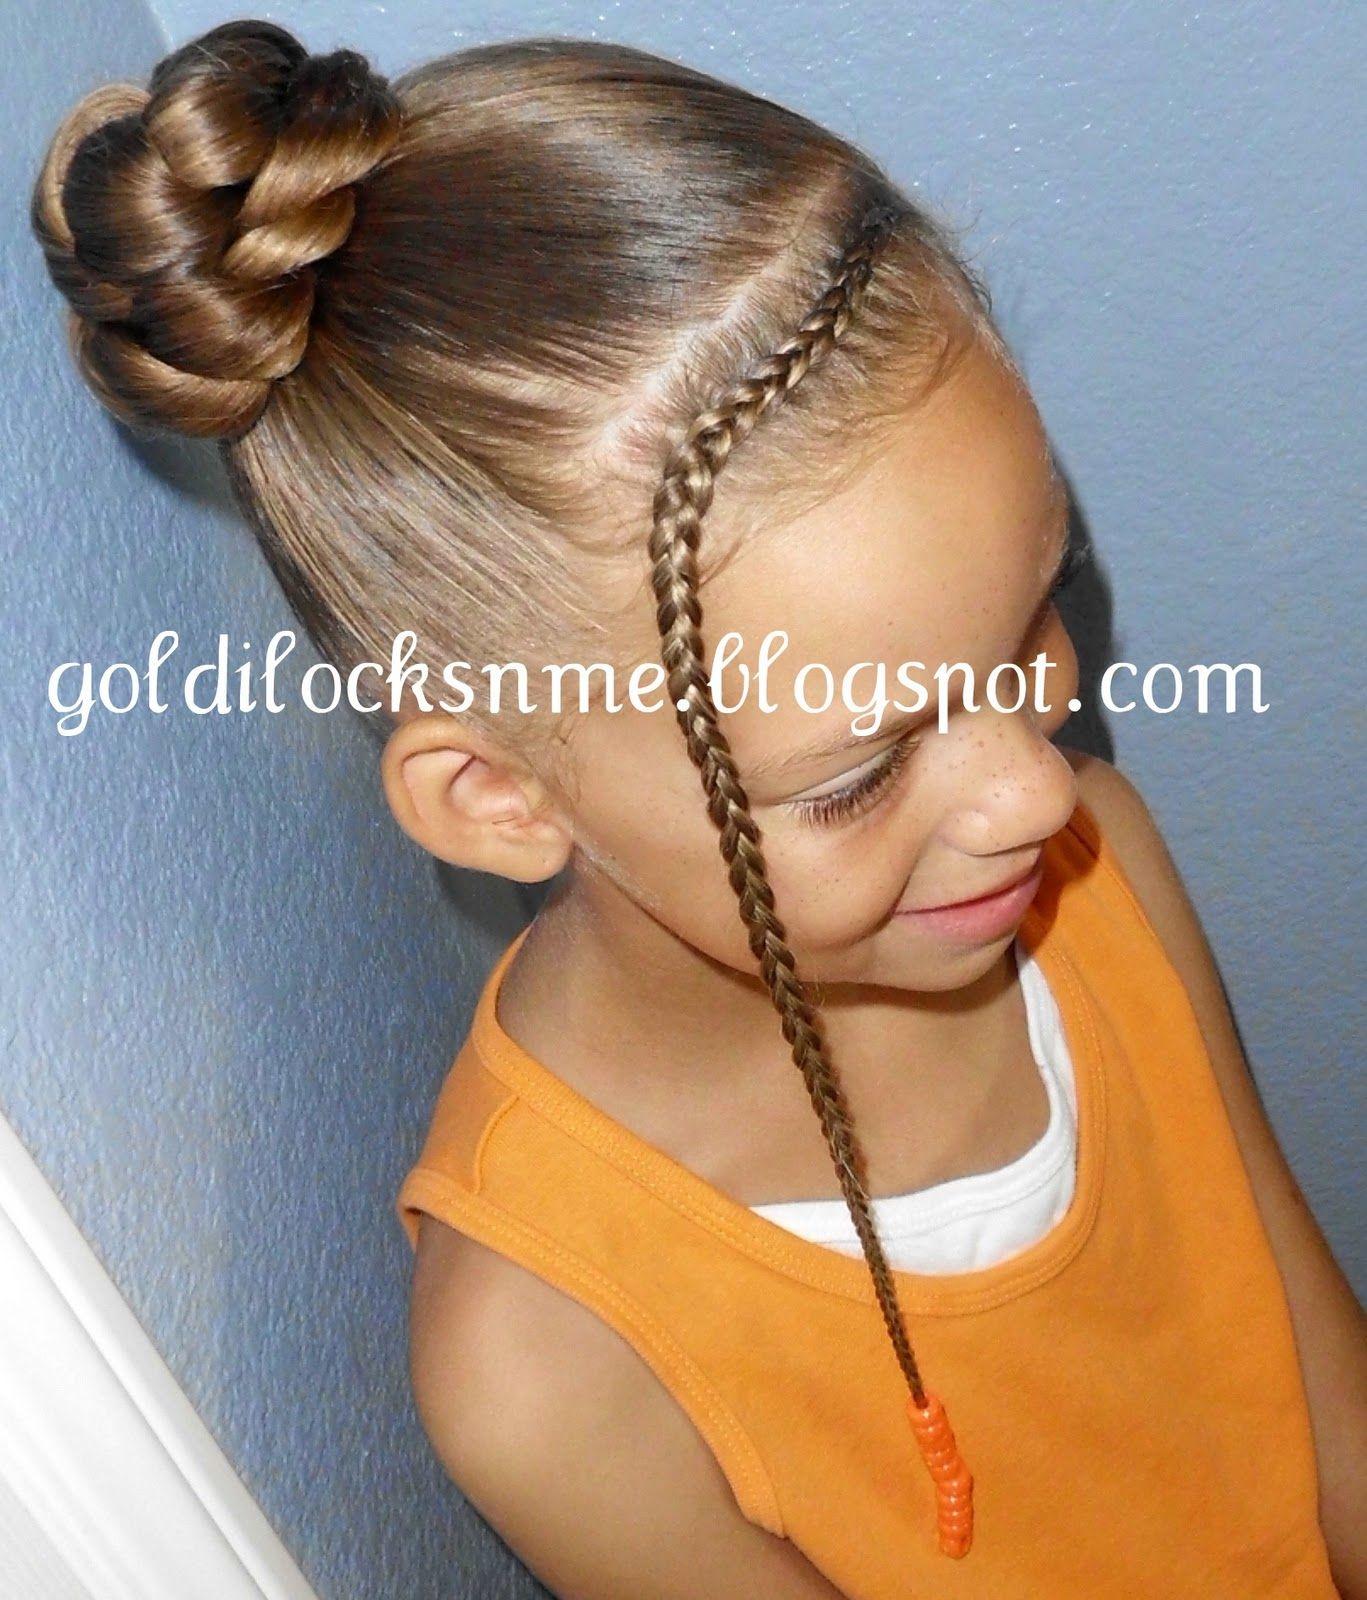 Goldilocksnme little girls hair pinterest kid hairstyles